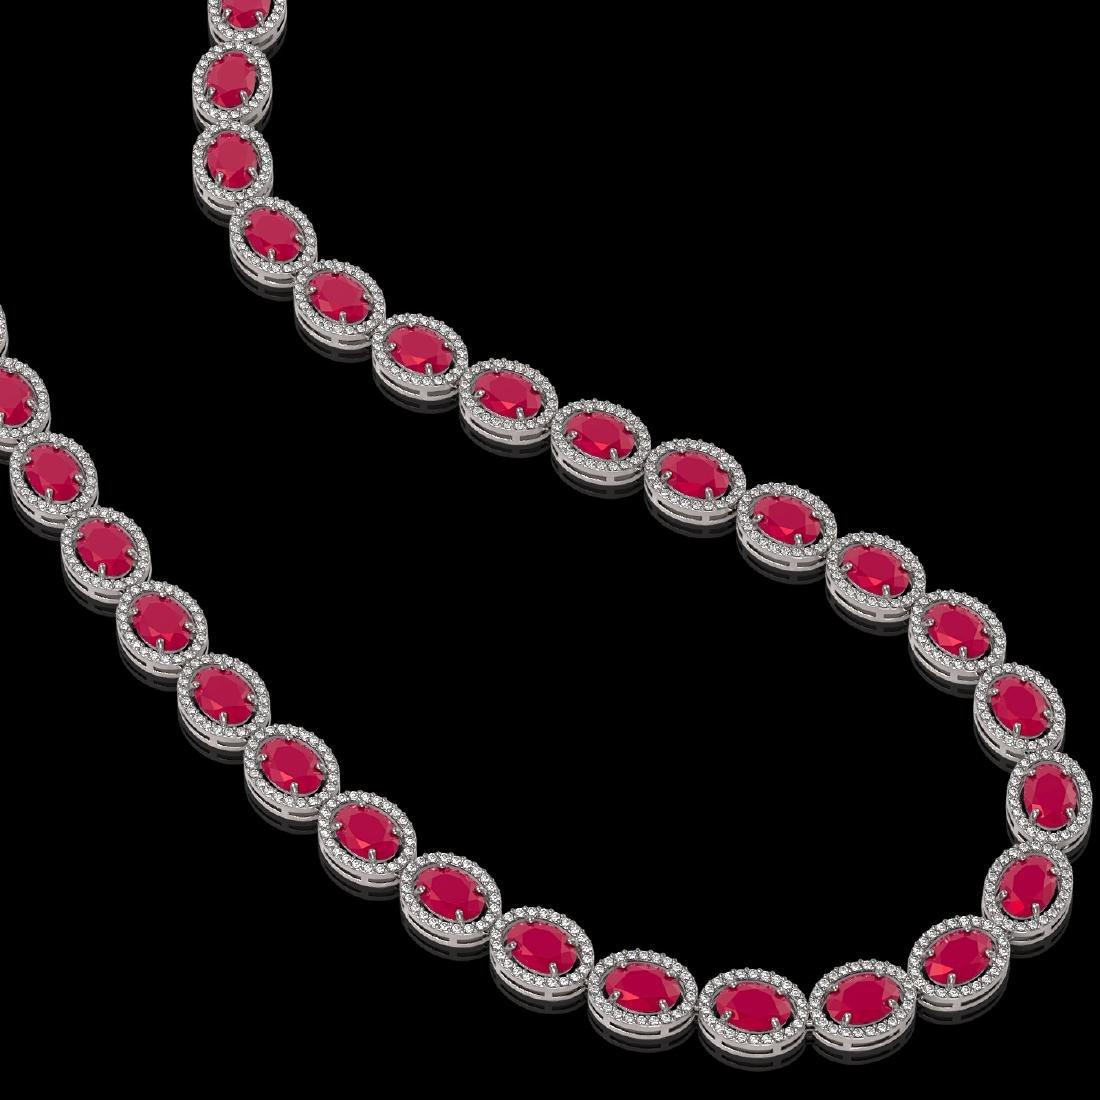 52.15 CTW Ruby & Diamond Halo Necklace 10K White Gold - 2